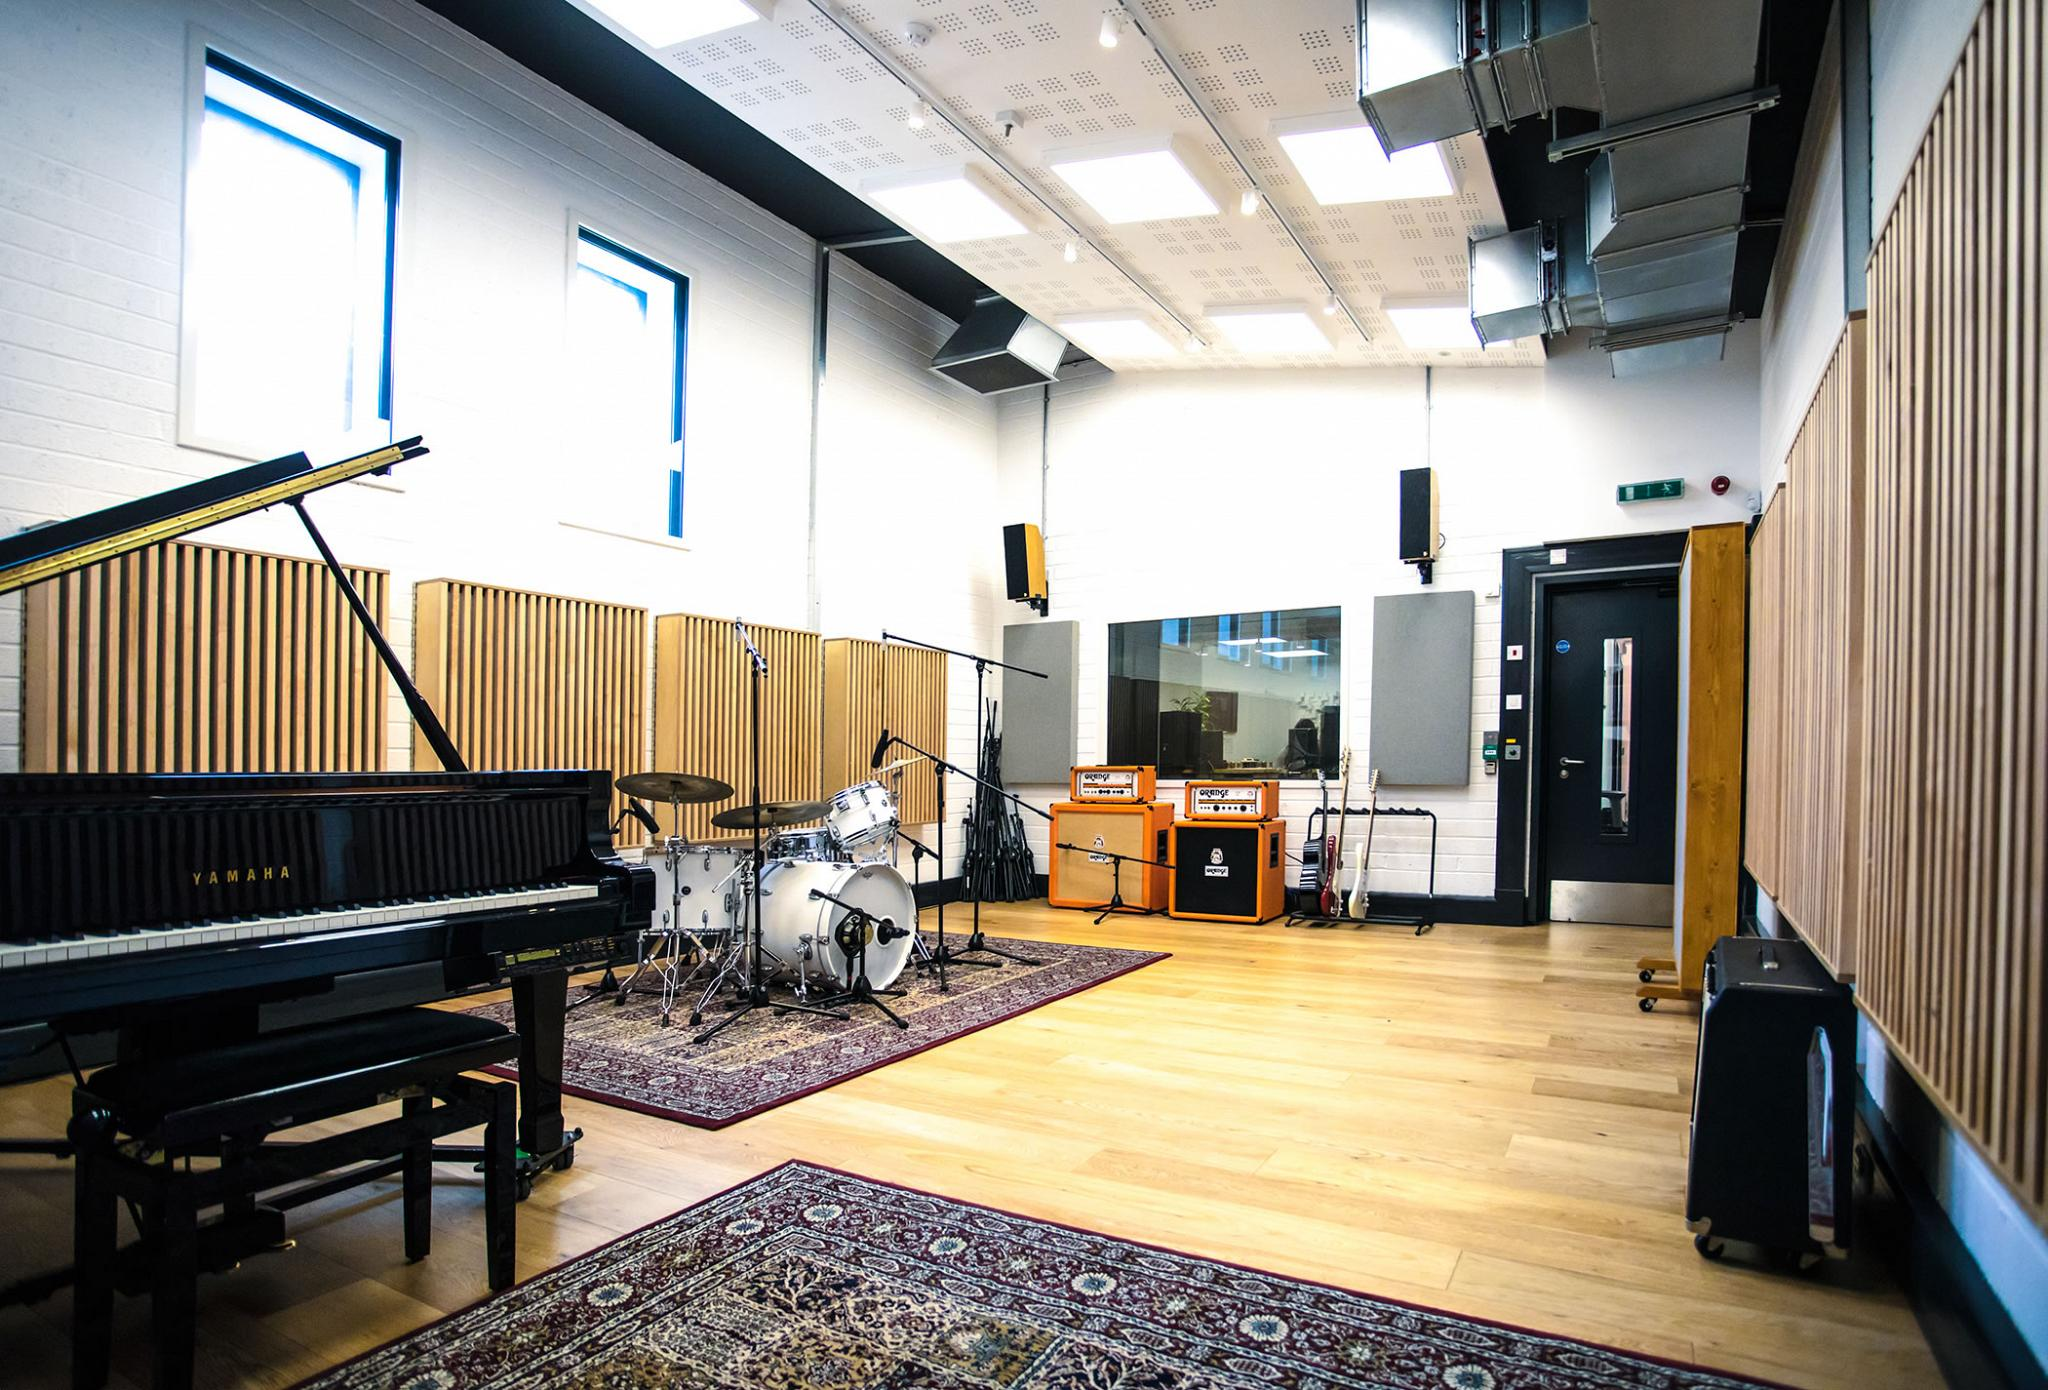 studios goldsmiths university of london